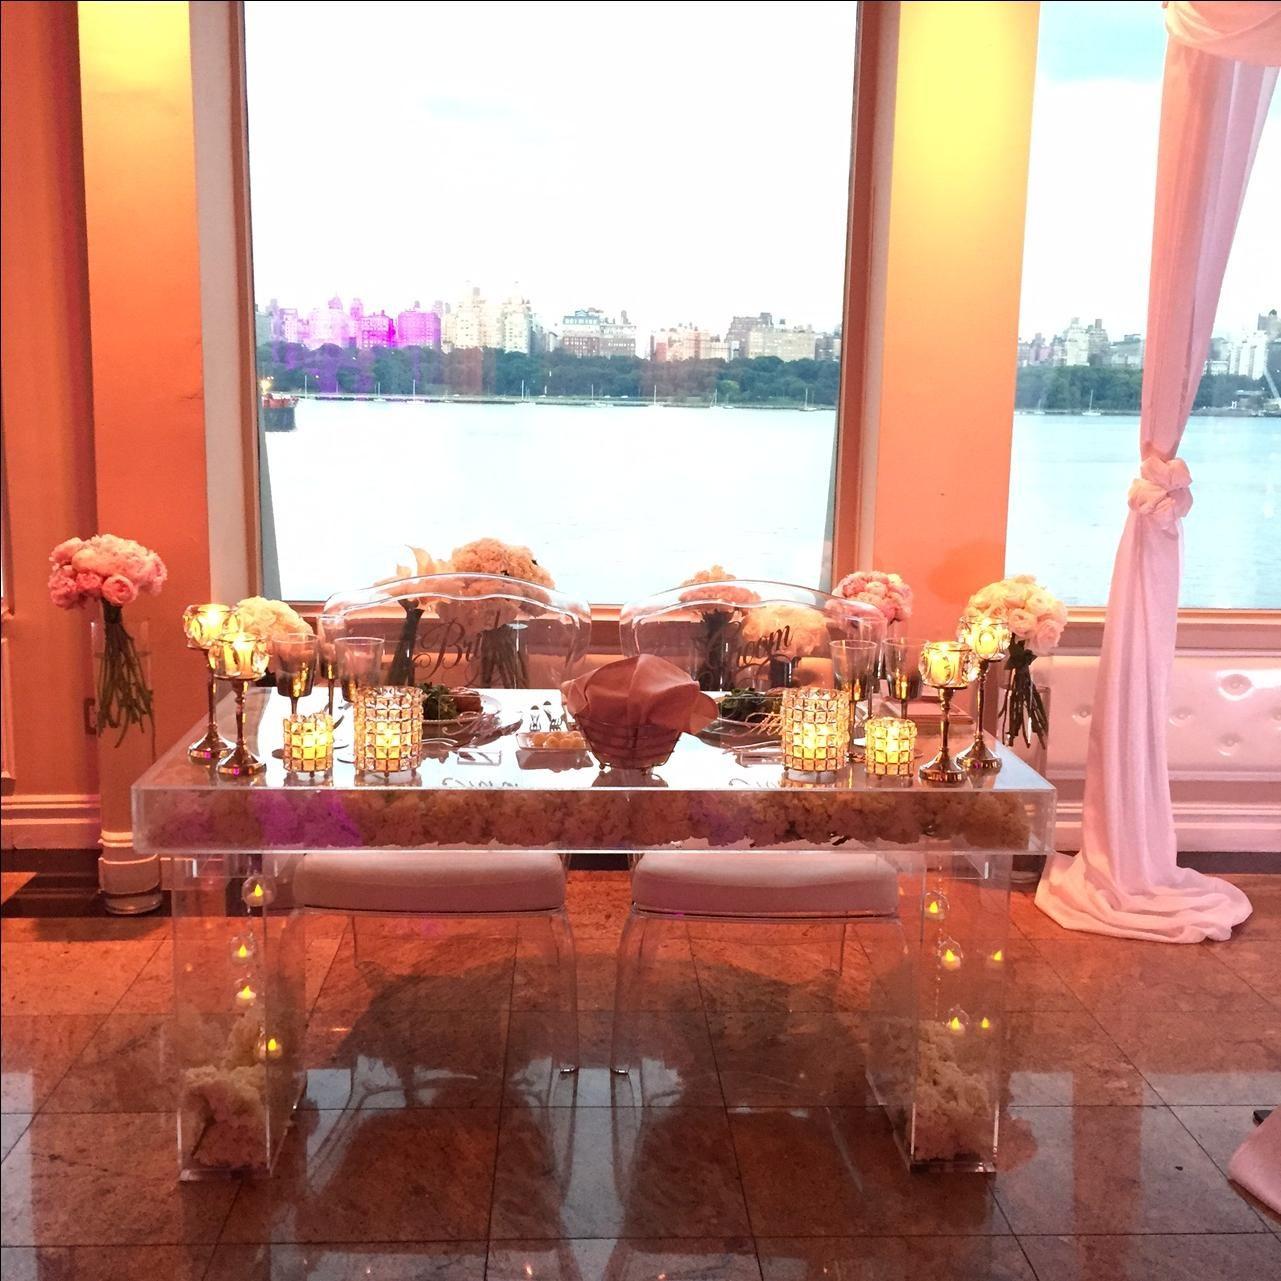 Buy a Hand Made Acrylic Bridal / Sweetheart Table. Clear Acrylic ...